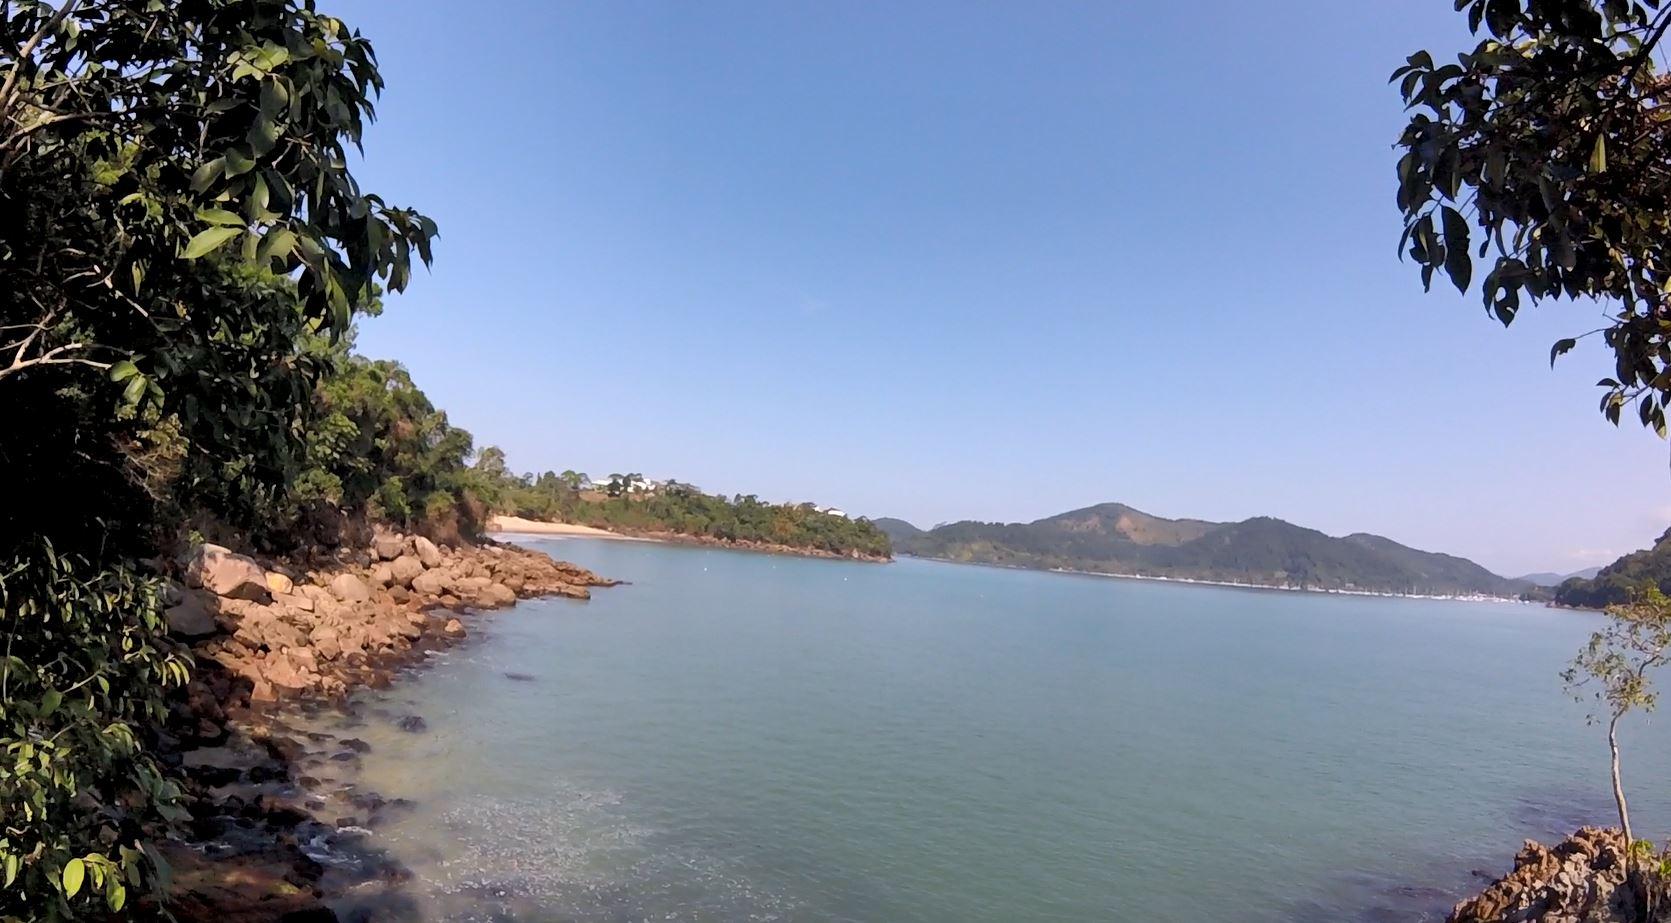 Trilha Praia de Santa Rita - Perequê